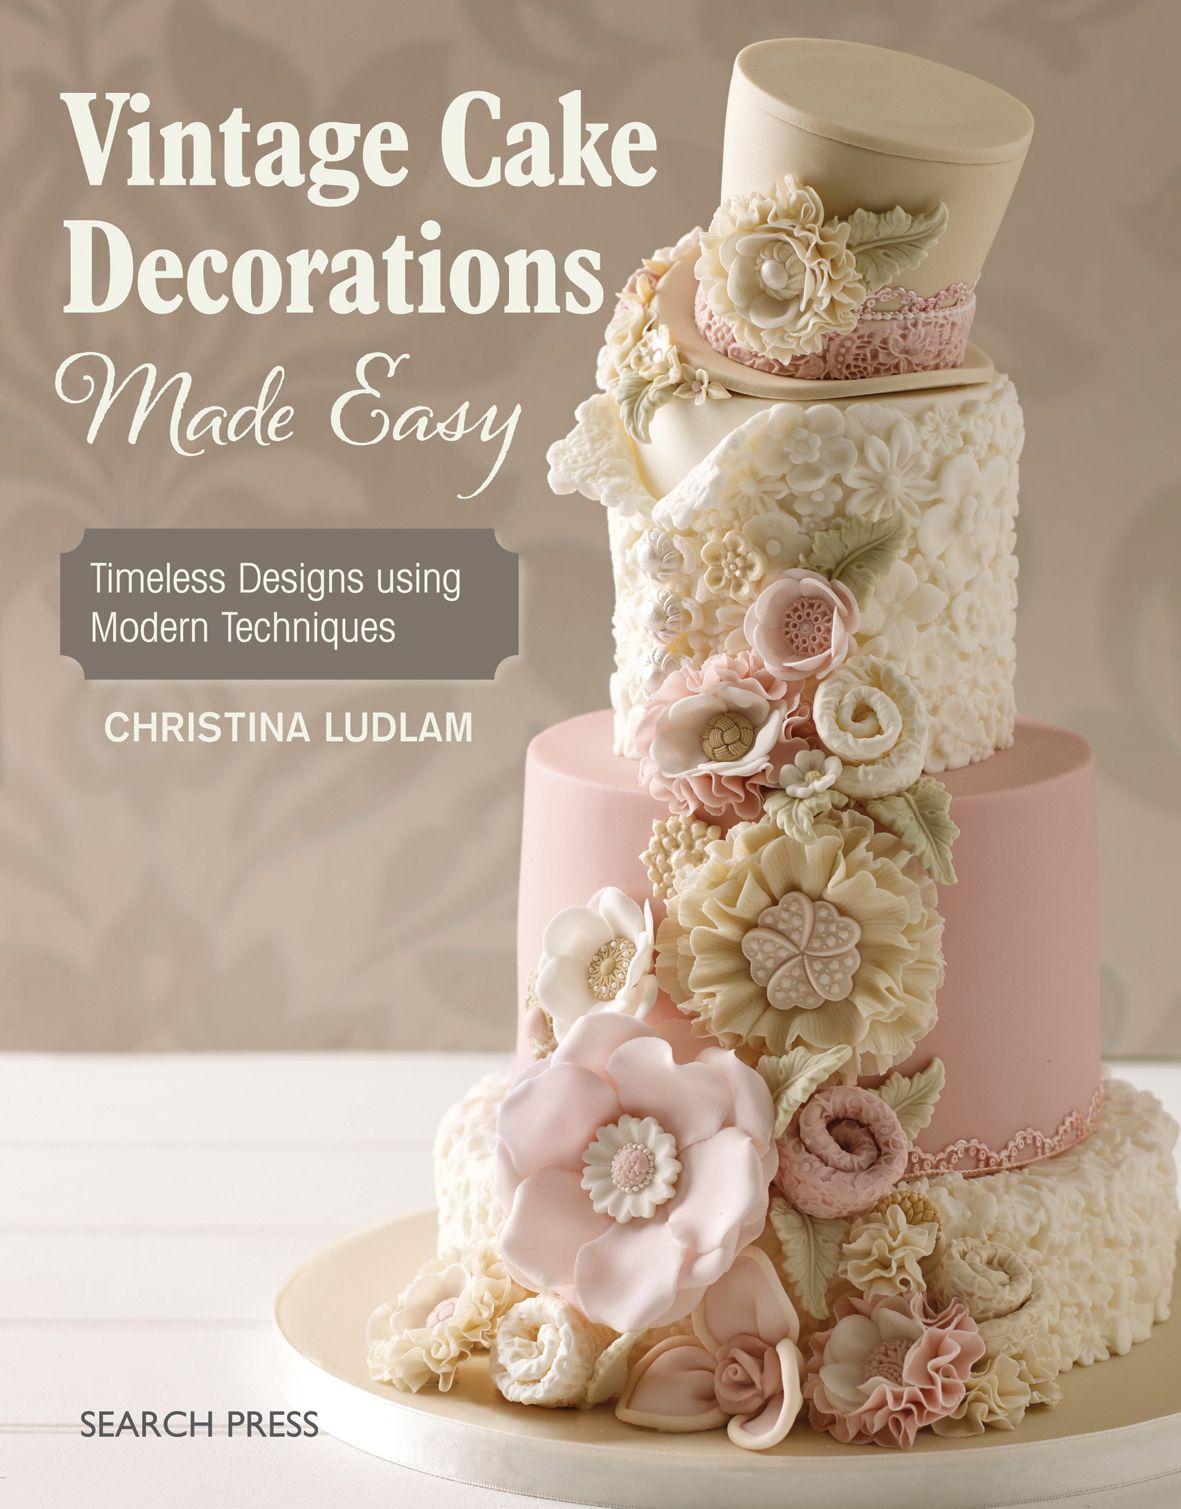 Vintage Cake Decoration Pattern Board  de